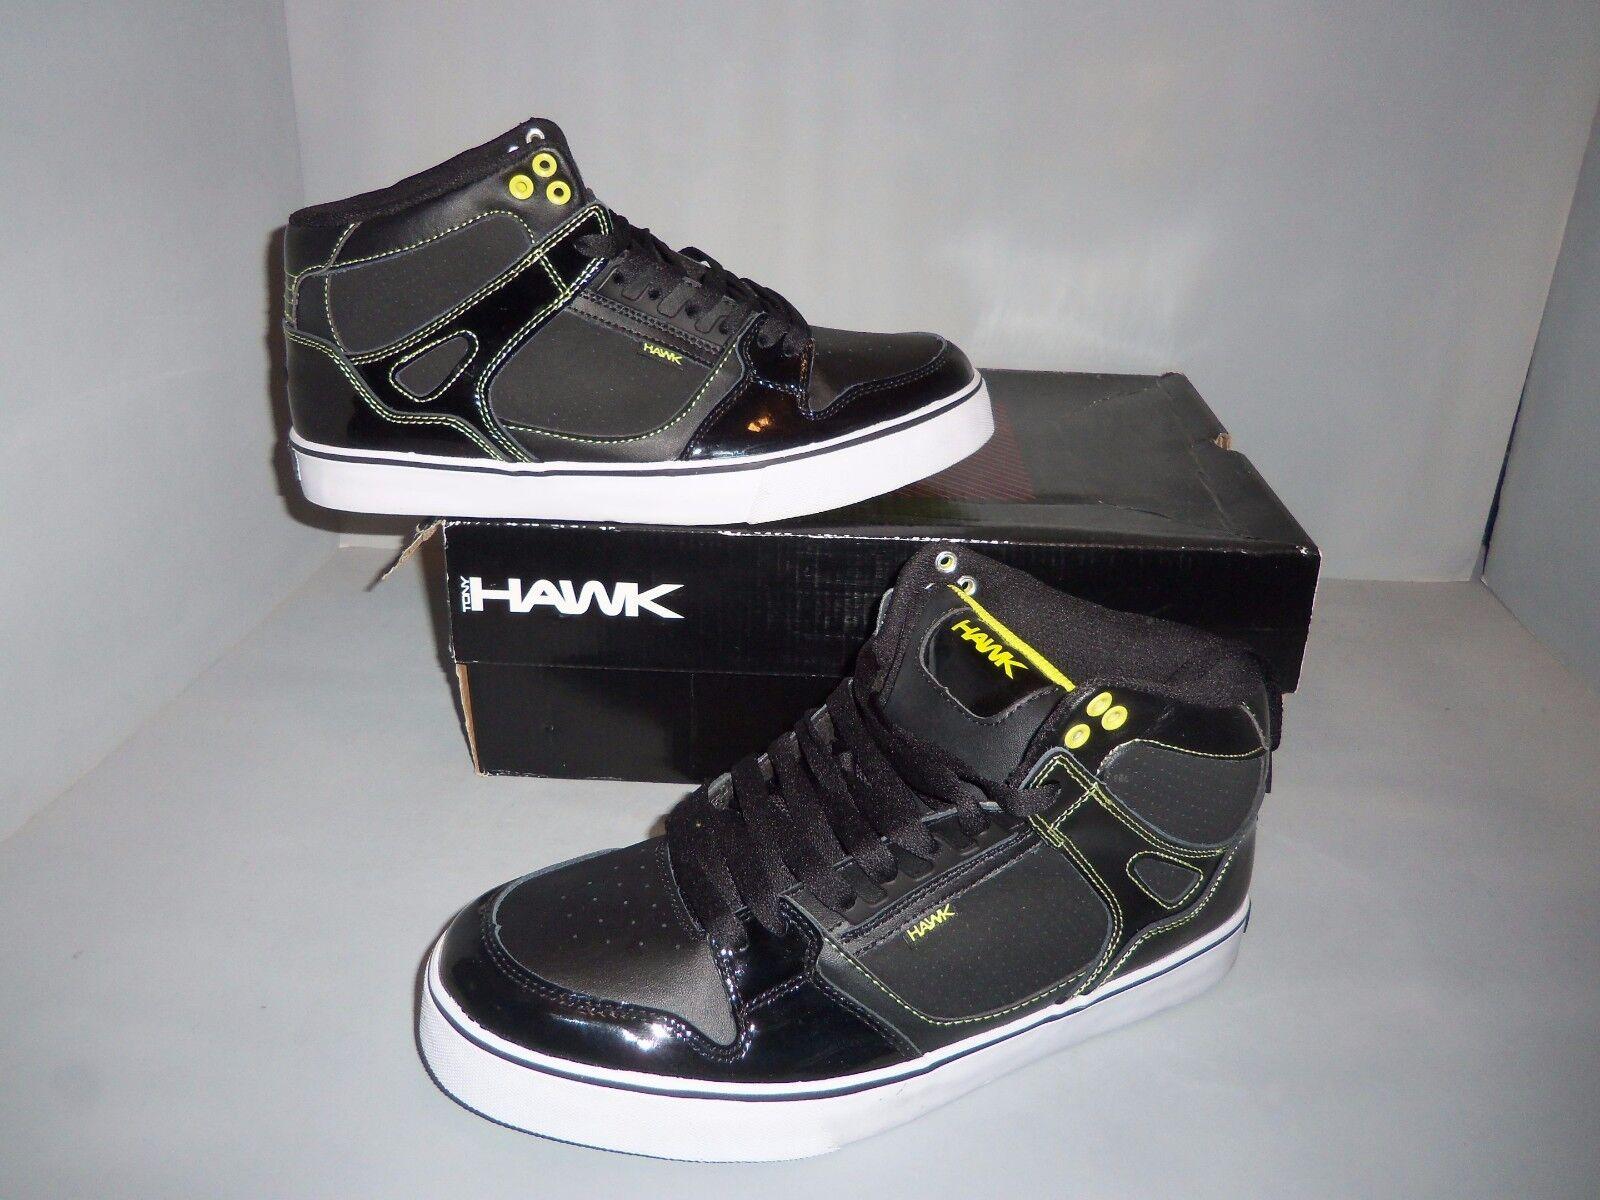 La reebok uomini scarpa pivot ii basso basket scarpa uomini dimensioni 9.5 nuova penna nera 8b163f